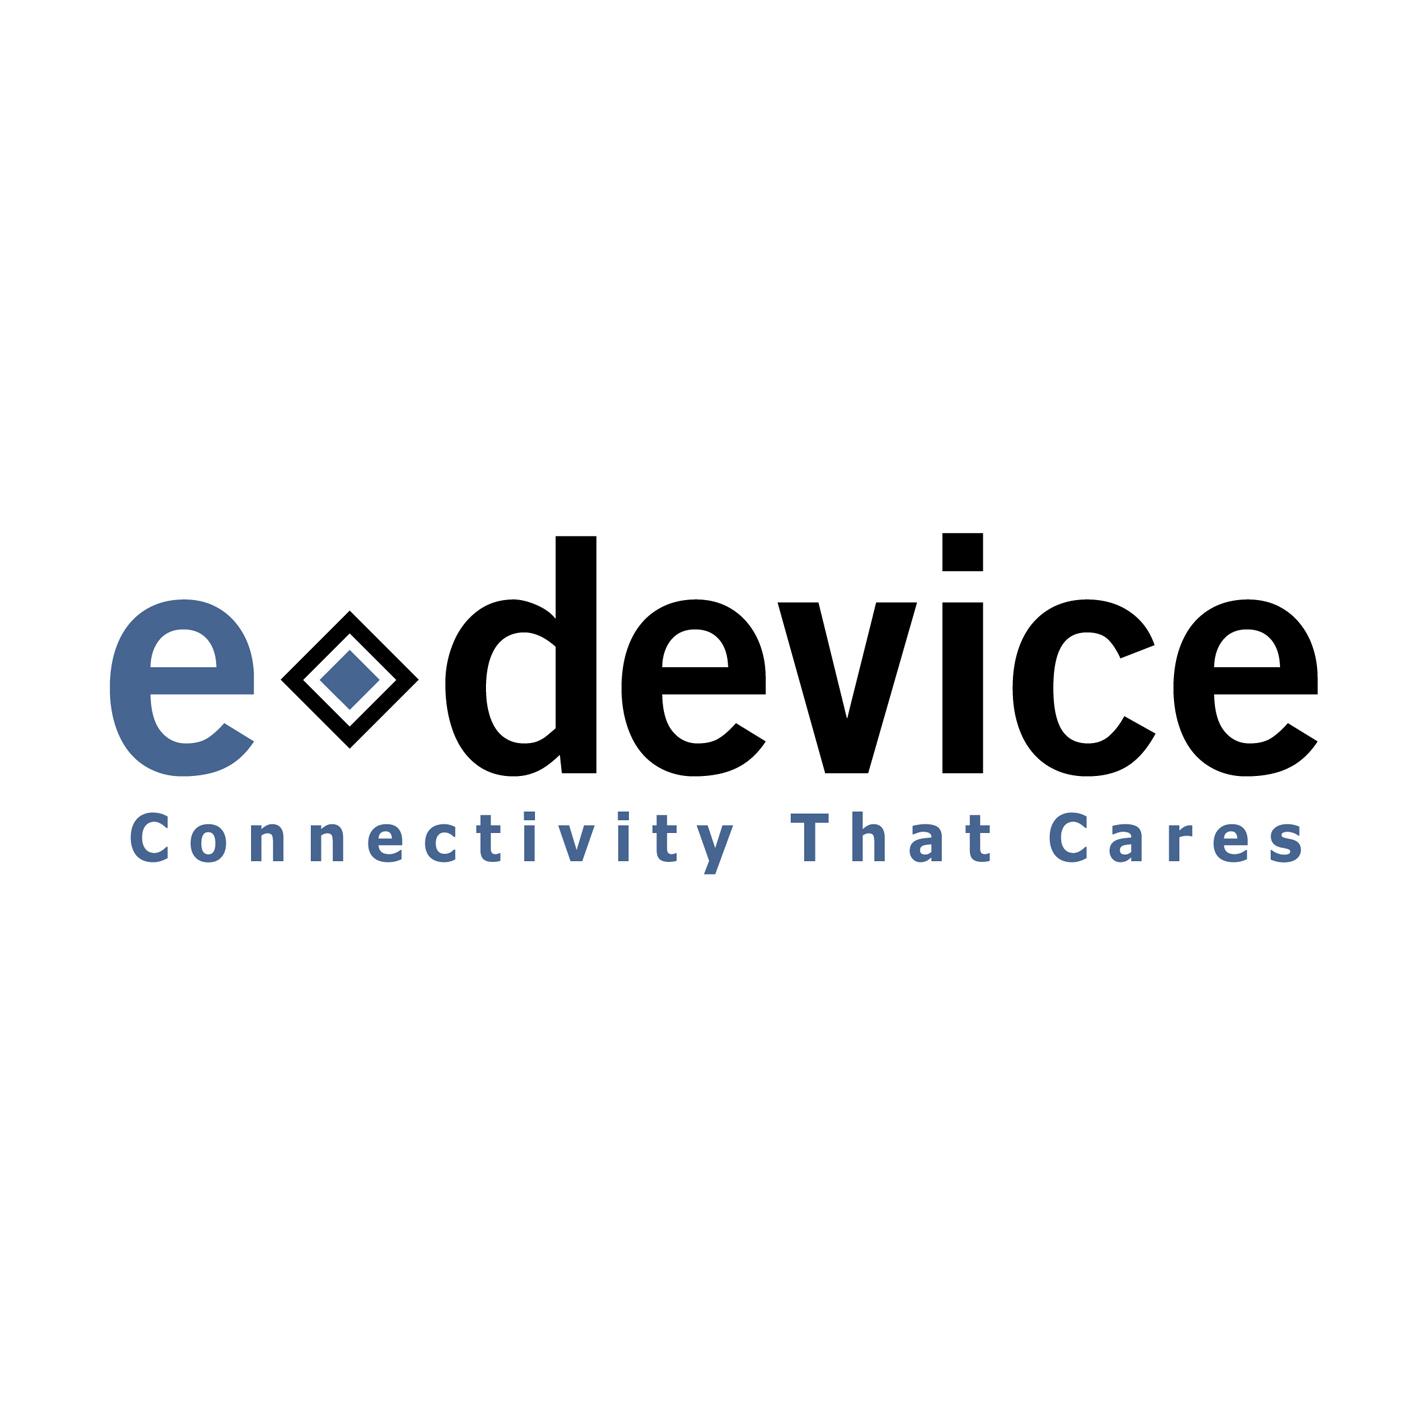 telemedicine  edevice  leading provider of connectivity